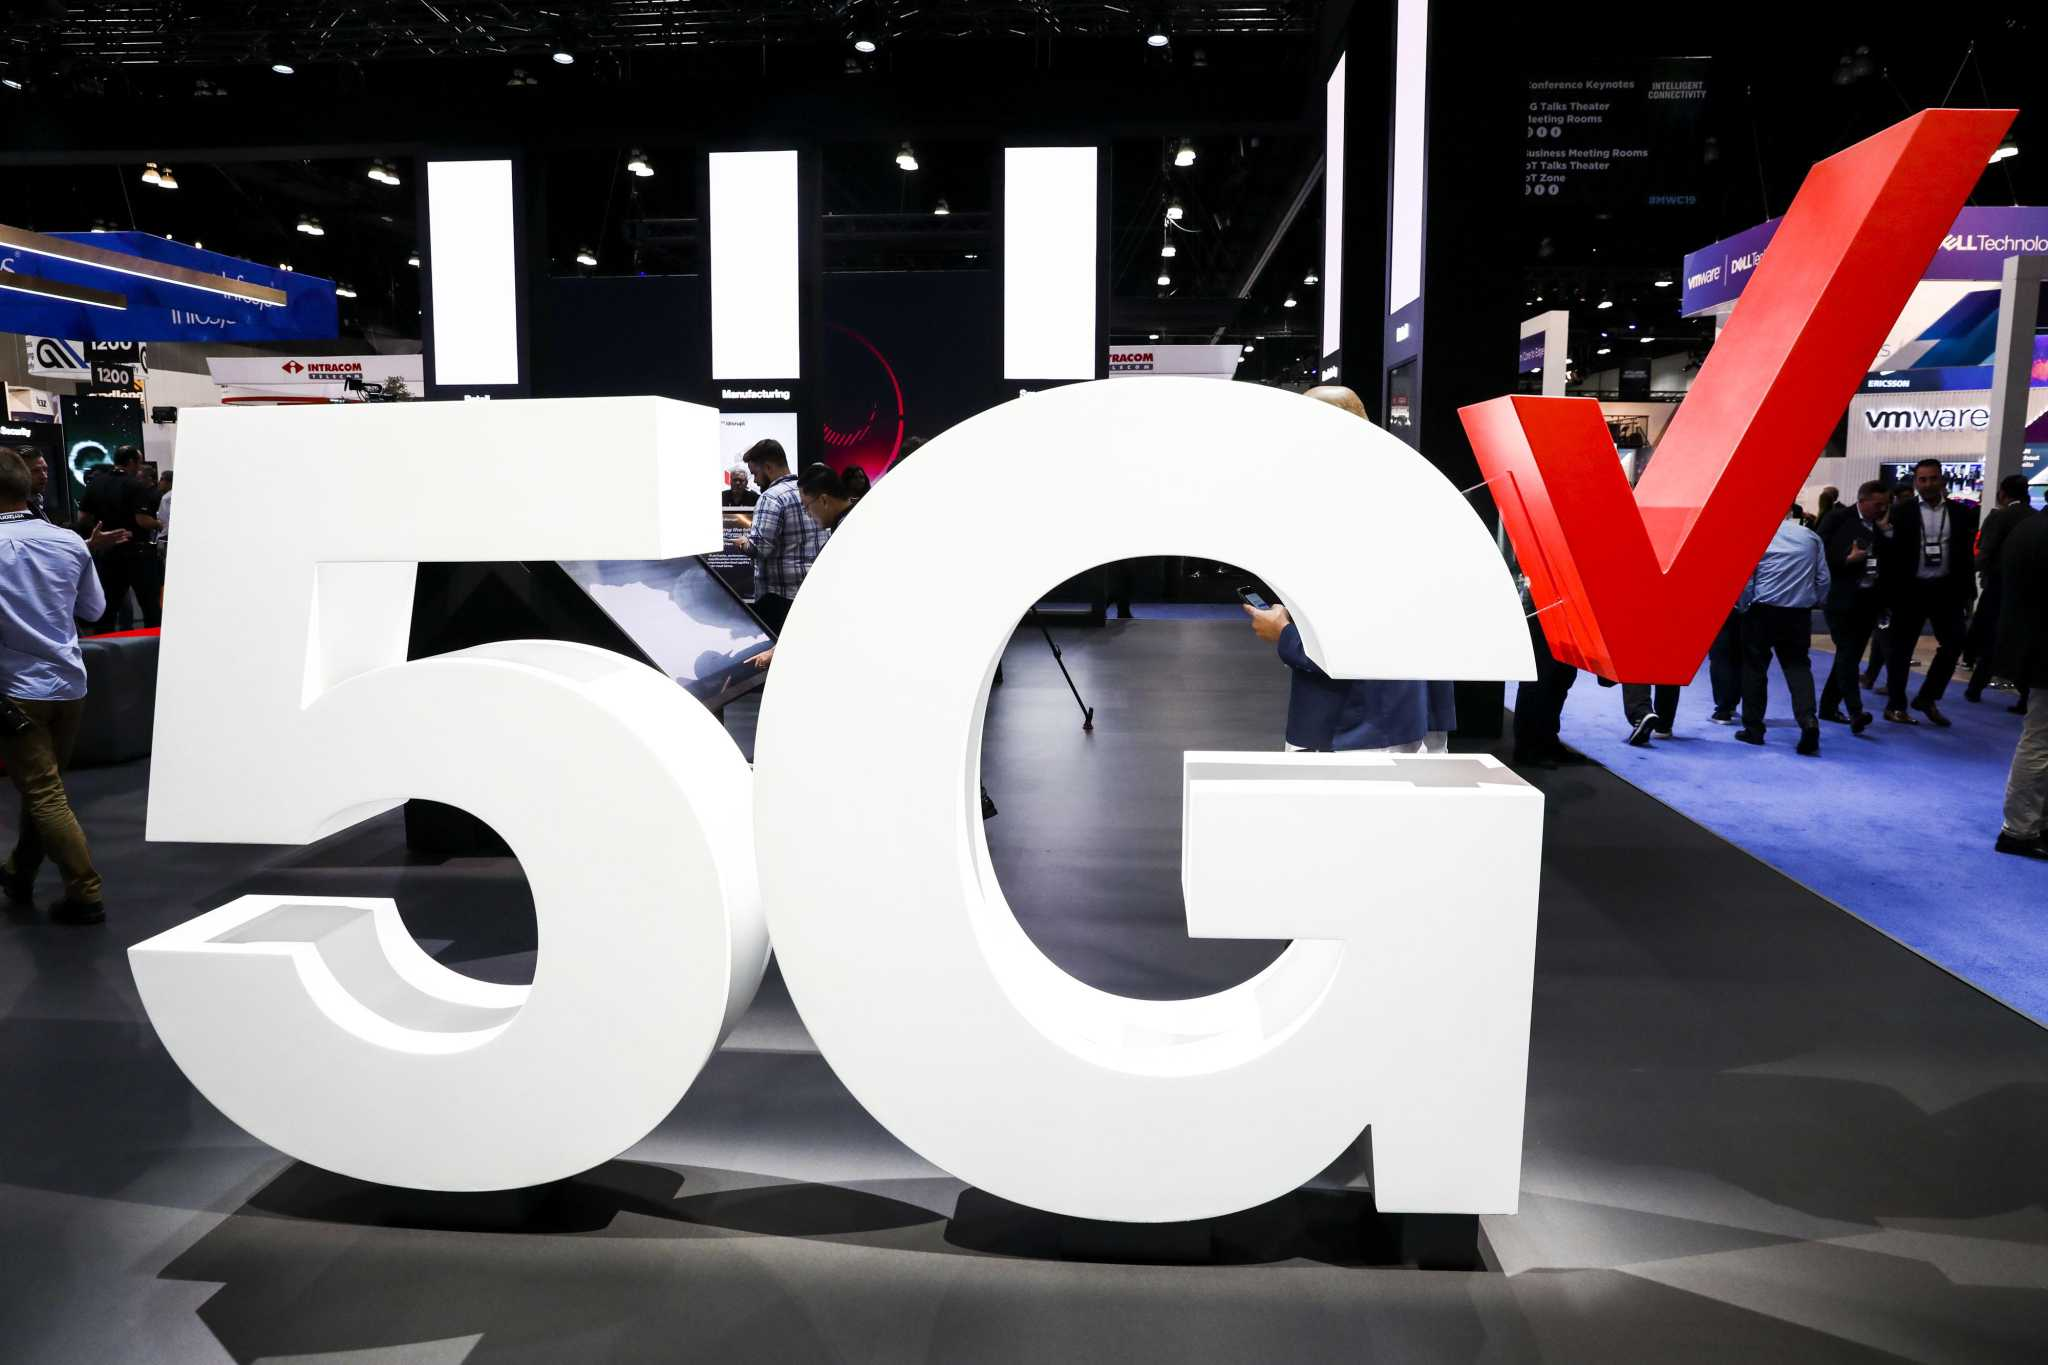 Verizon launches mobile 5G service in Houston